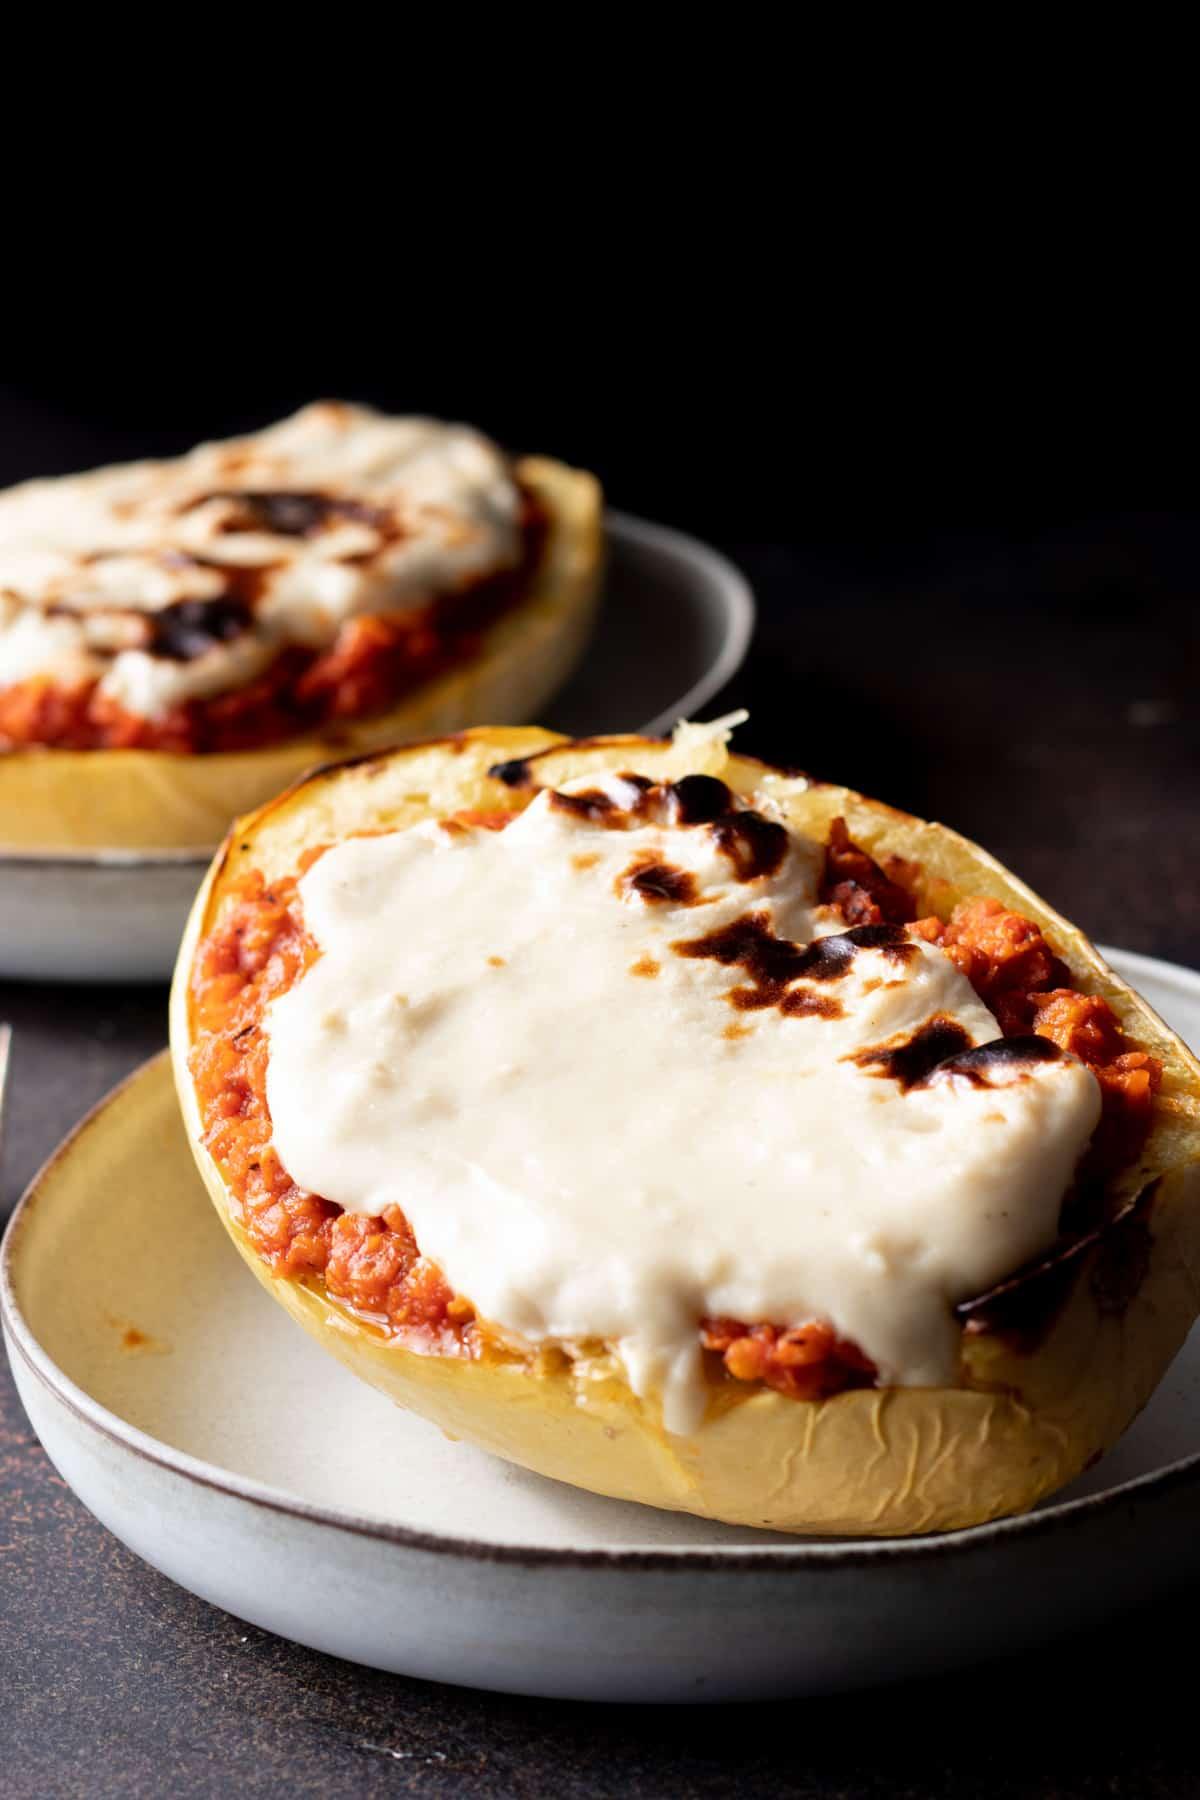 Vegan mozzarella melted on top of spaghetti squash lasagna boat.